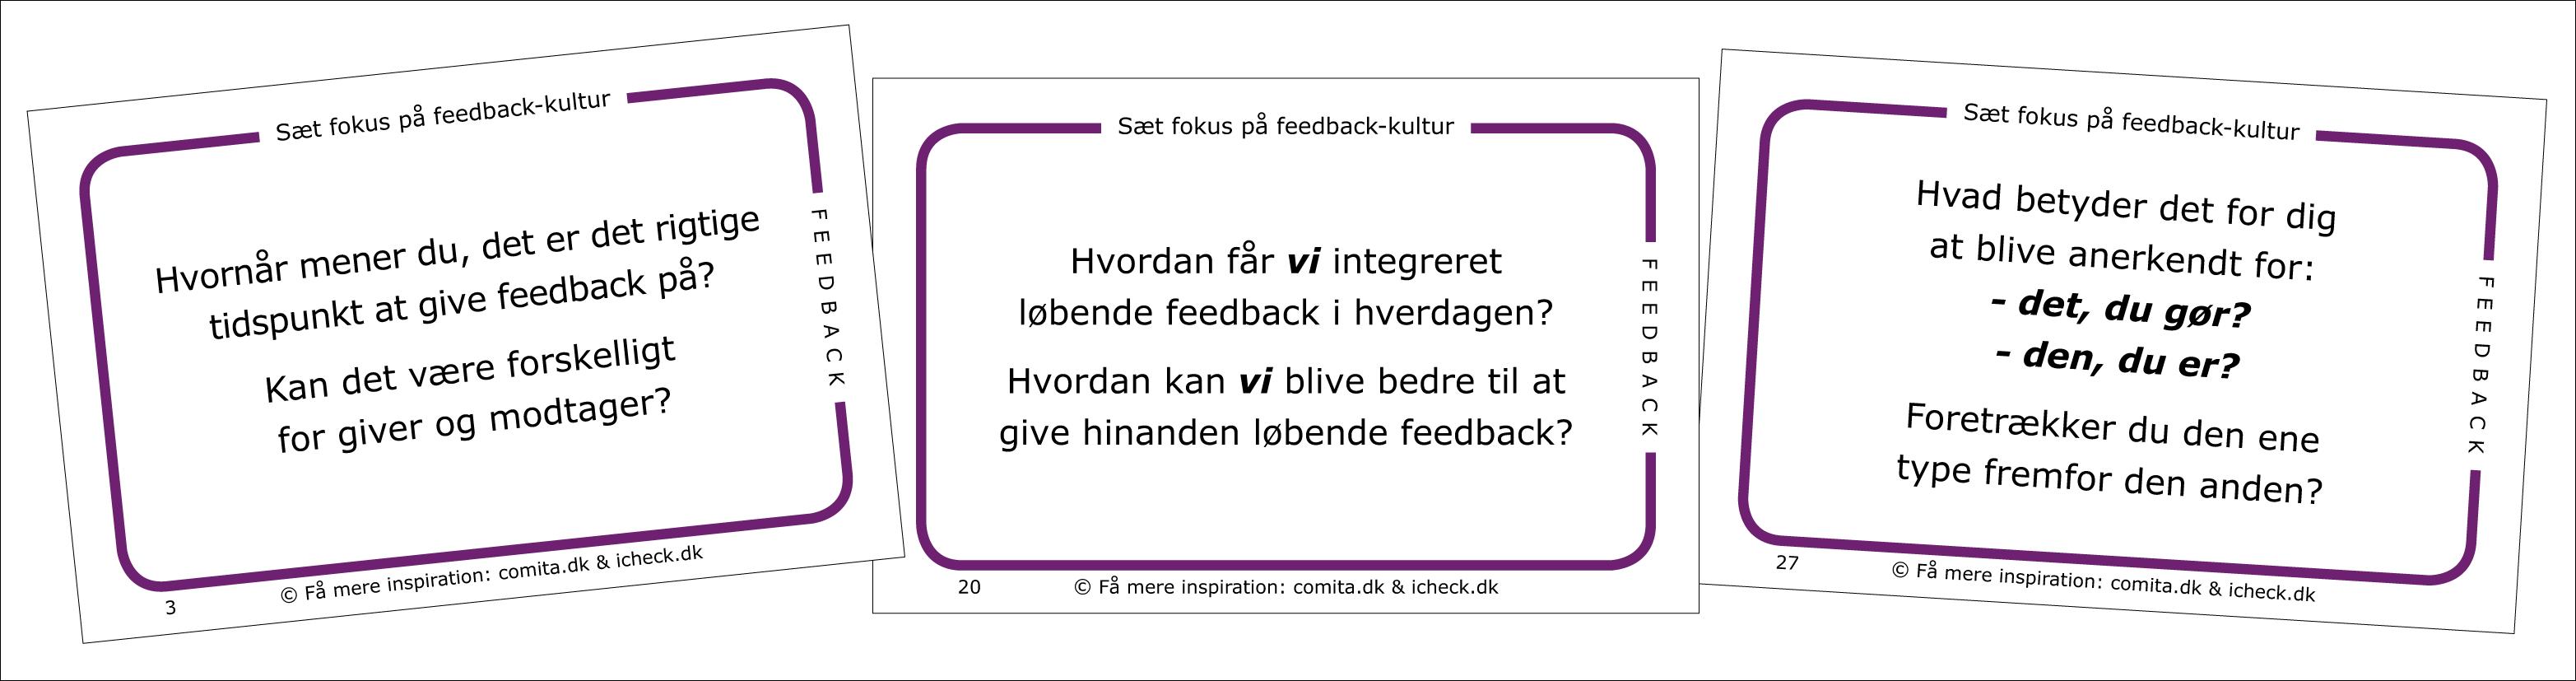 hvad betyder feedback